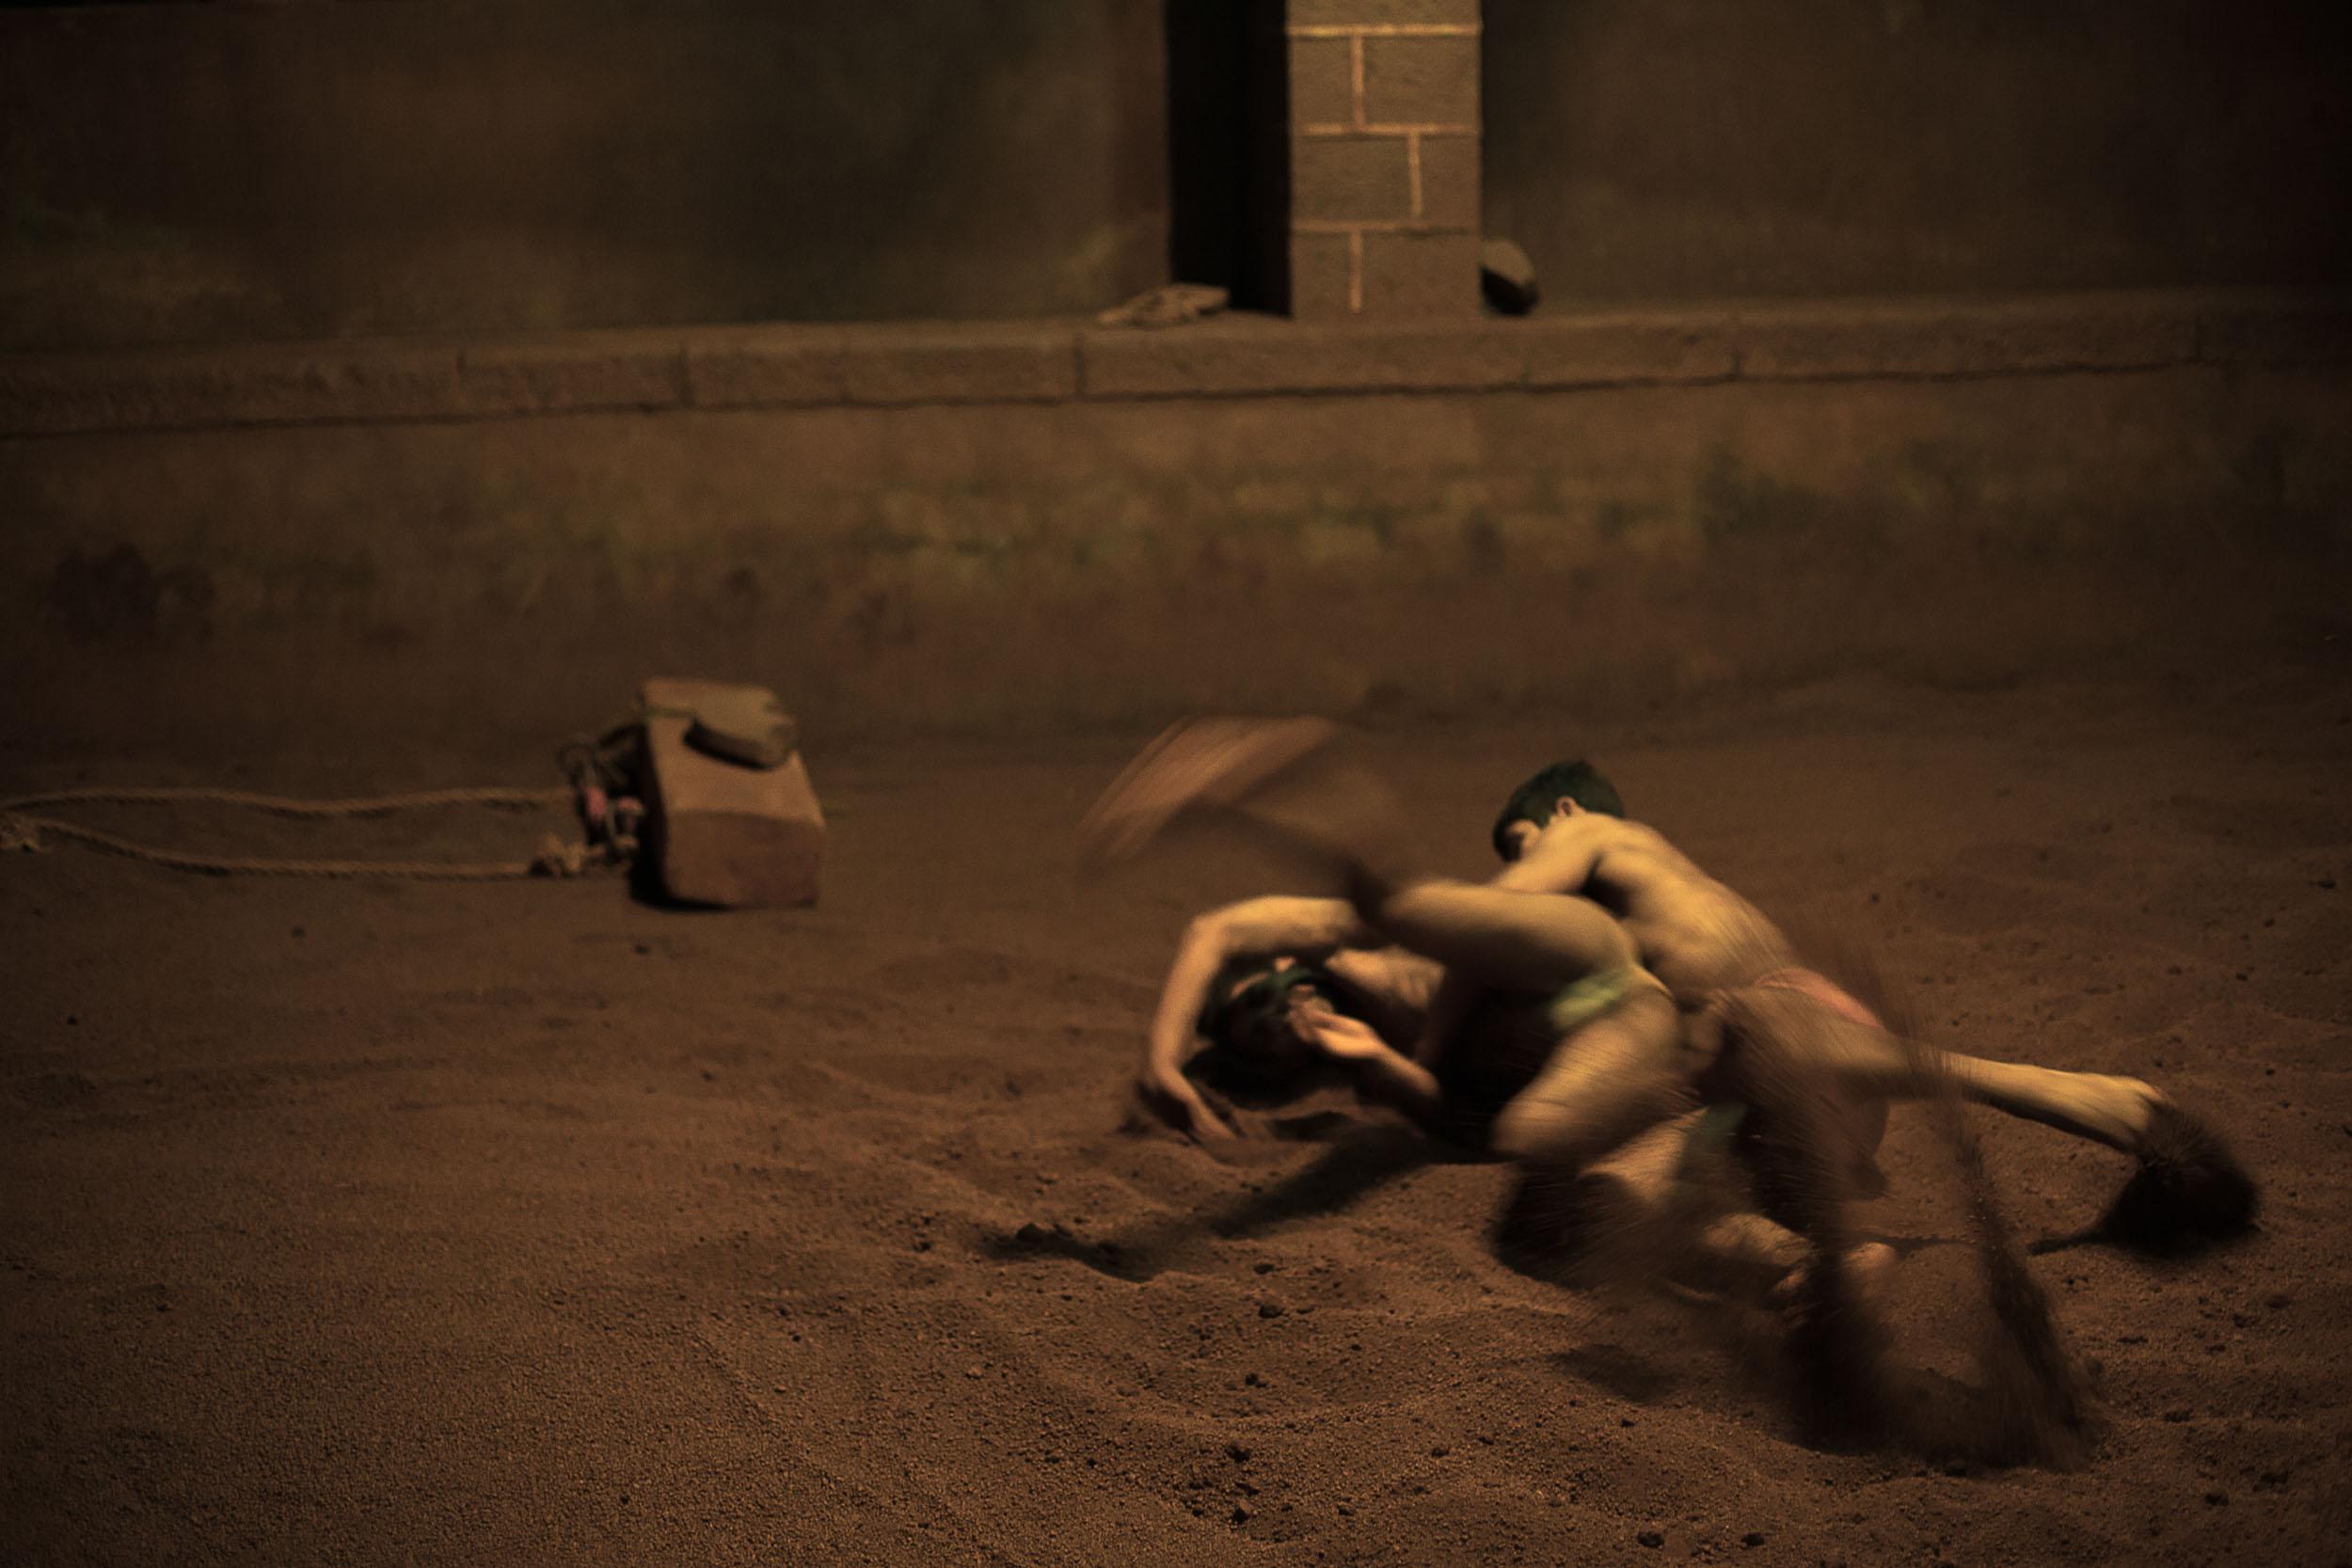 Sindhur_Photography_Travel_People_Wrestlers-3.JPG